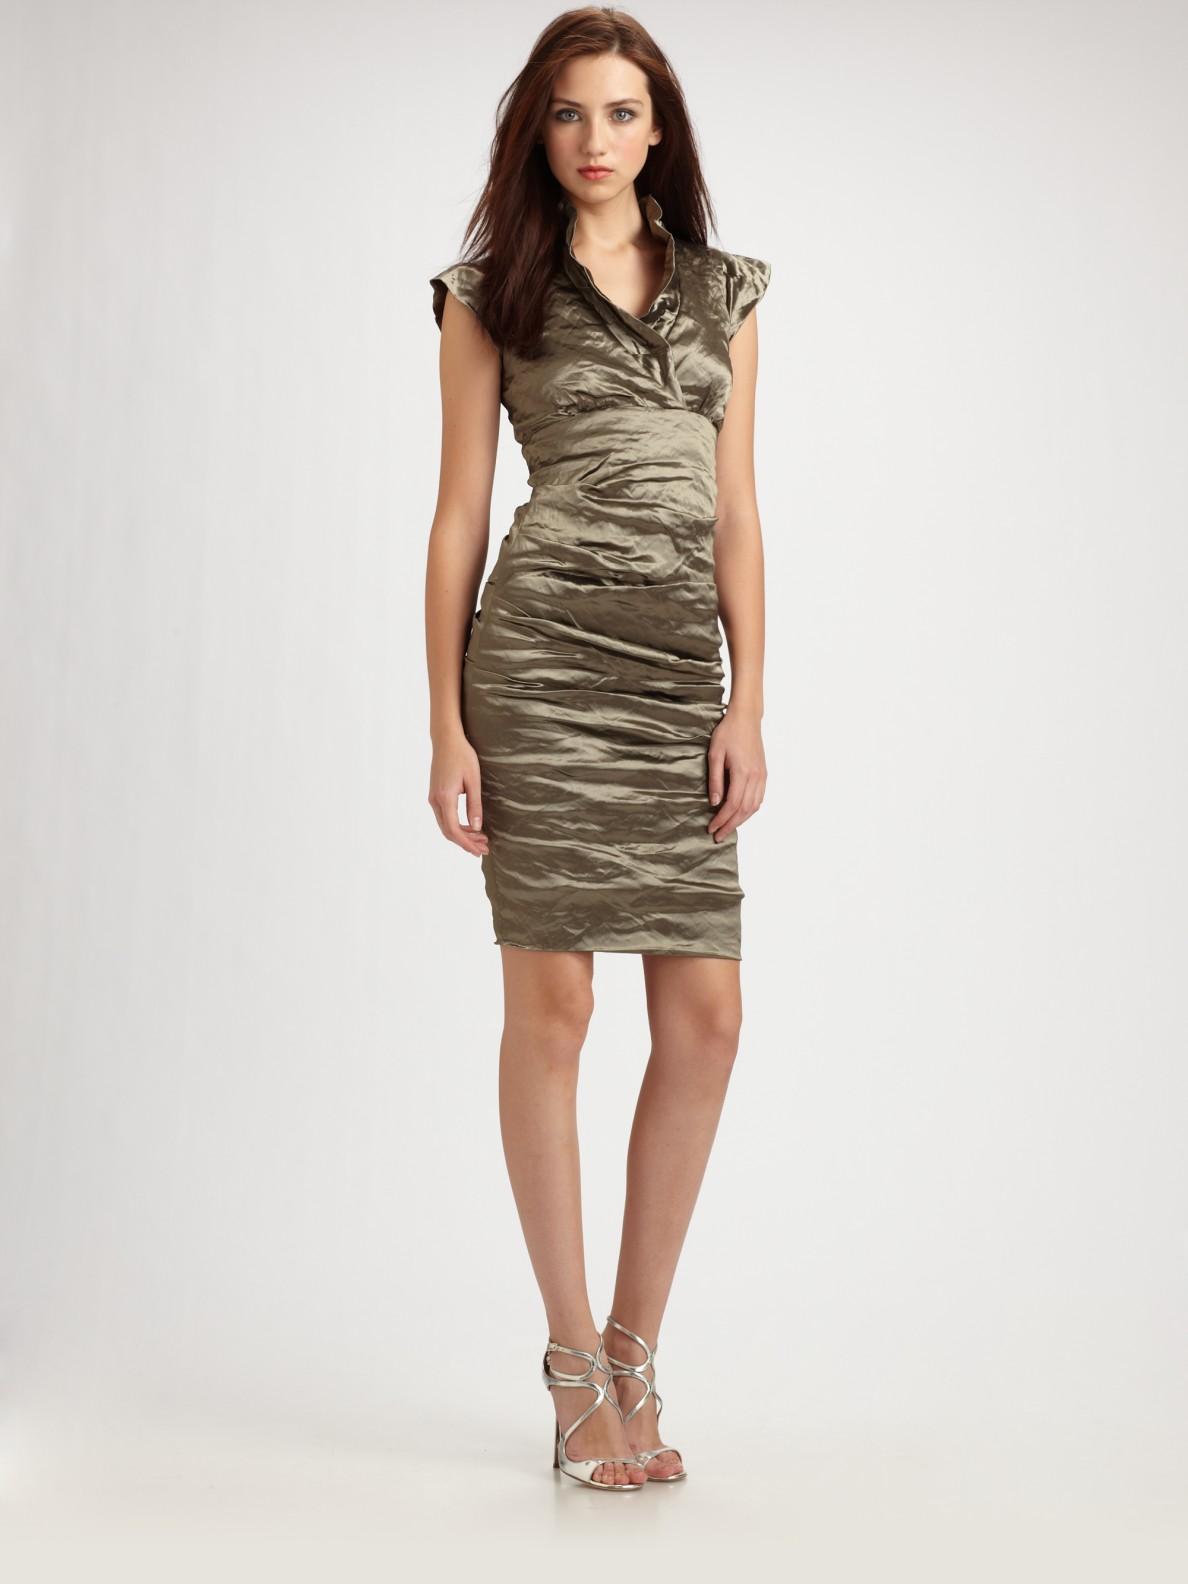 Nicole miller Cap Sleeve Cocktail Dress in Metallic  Lyst